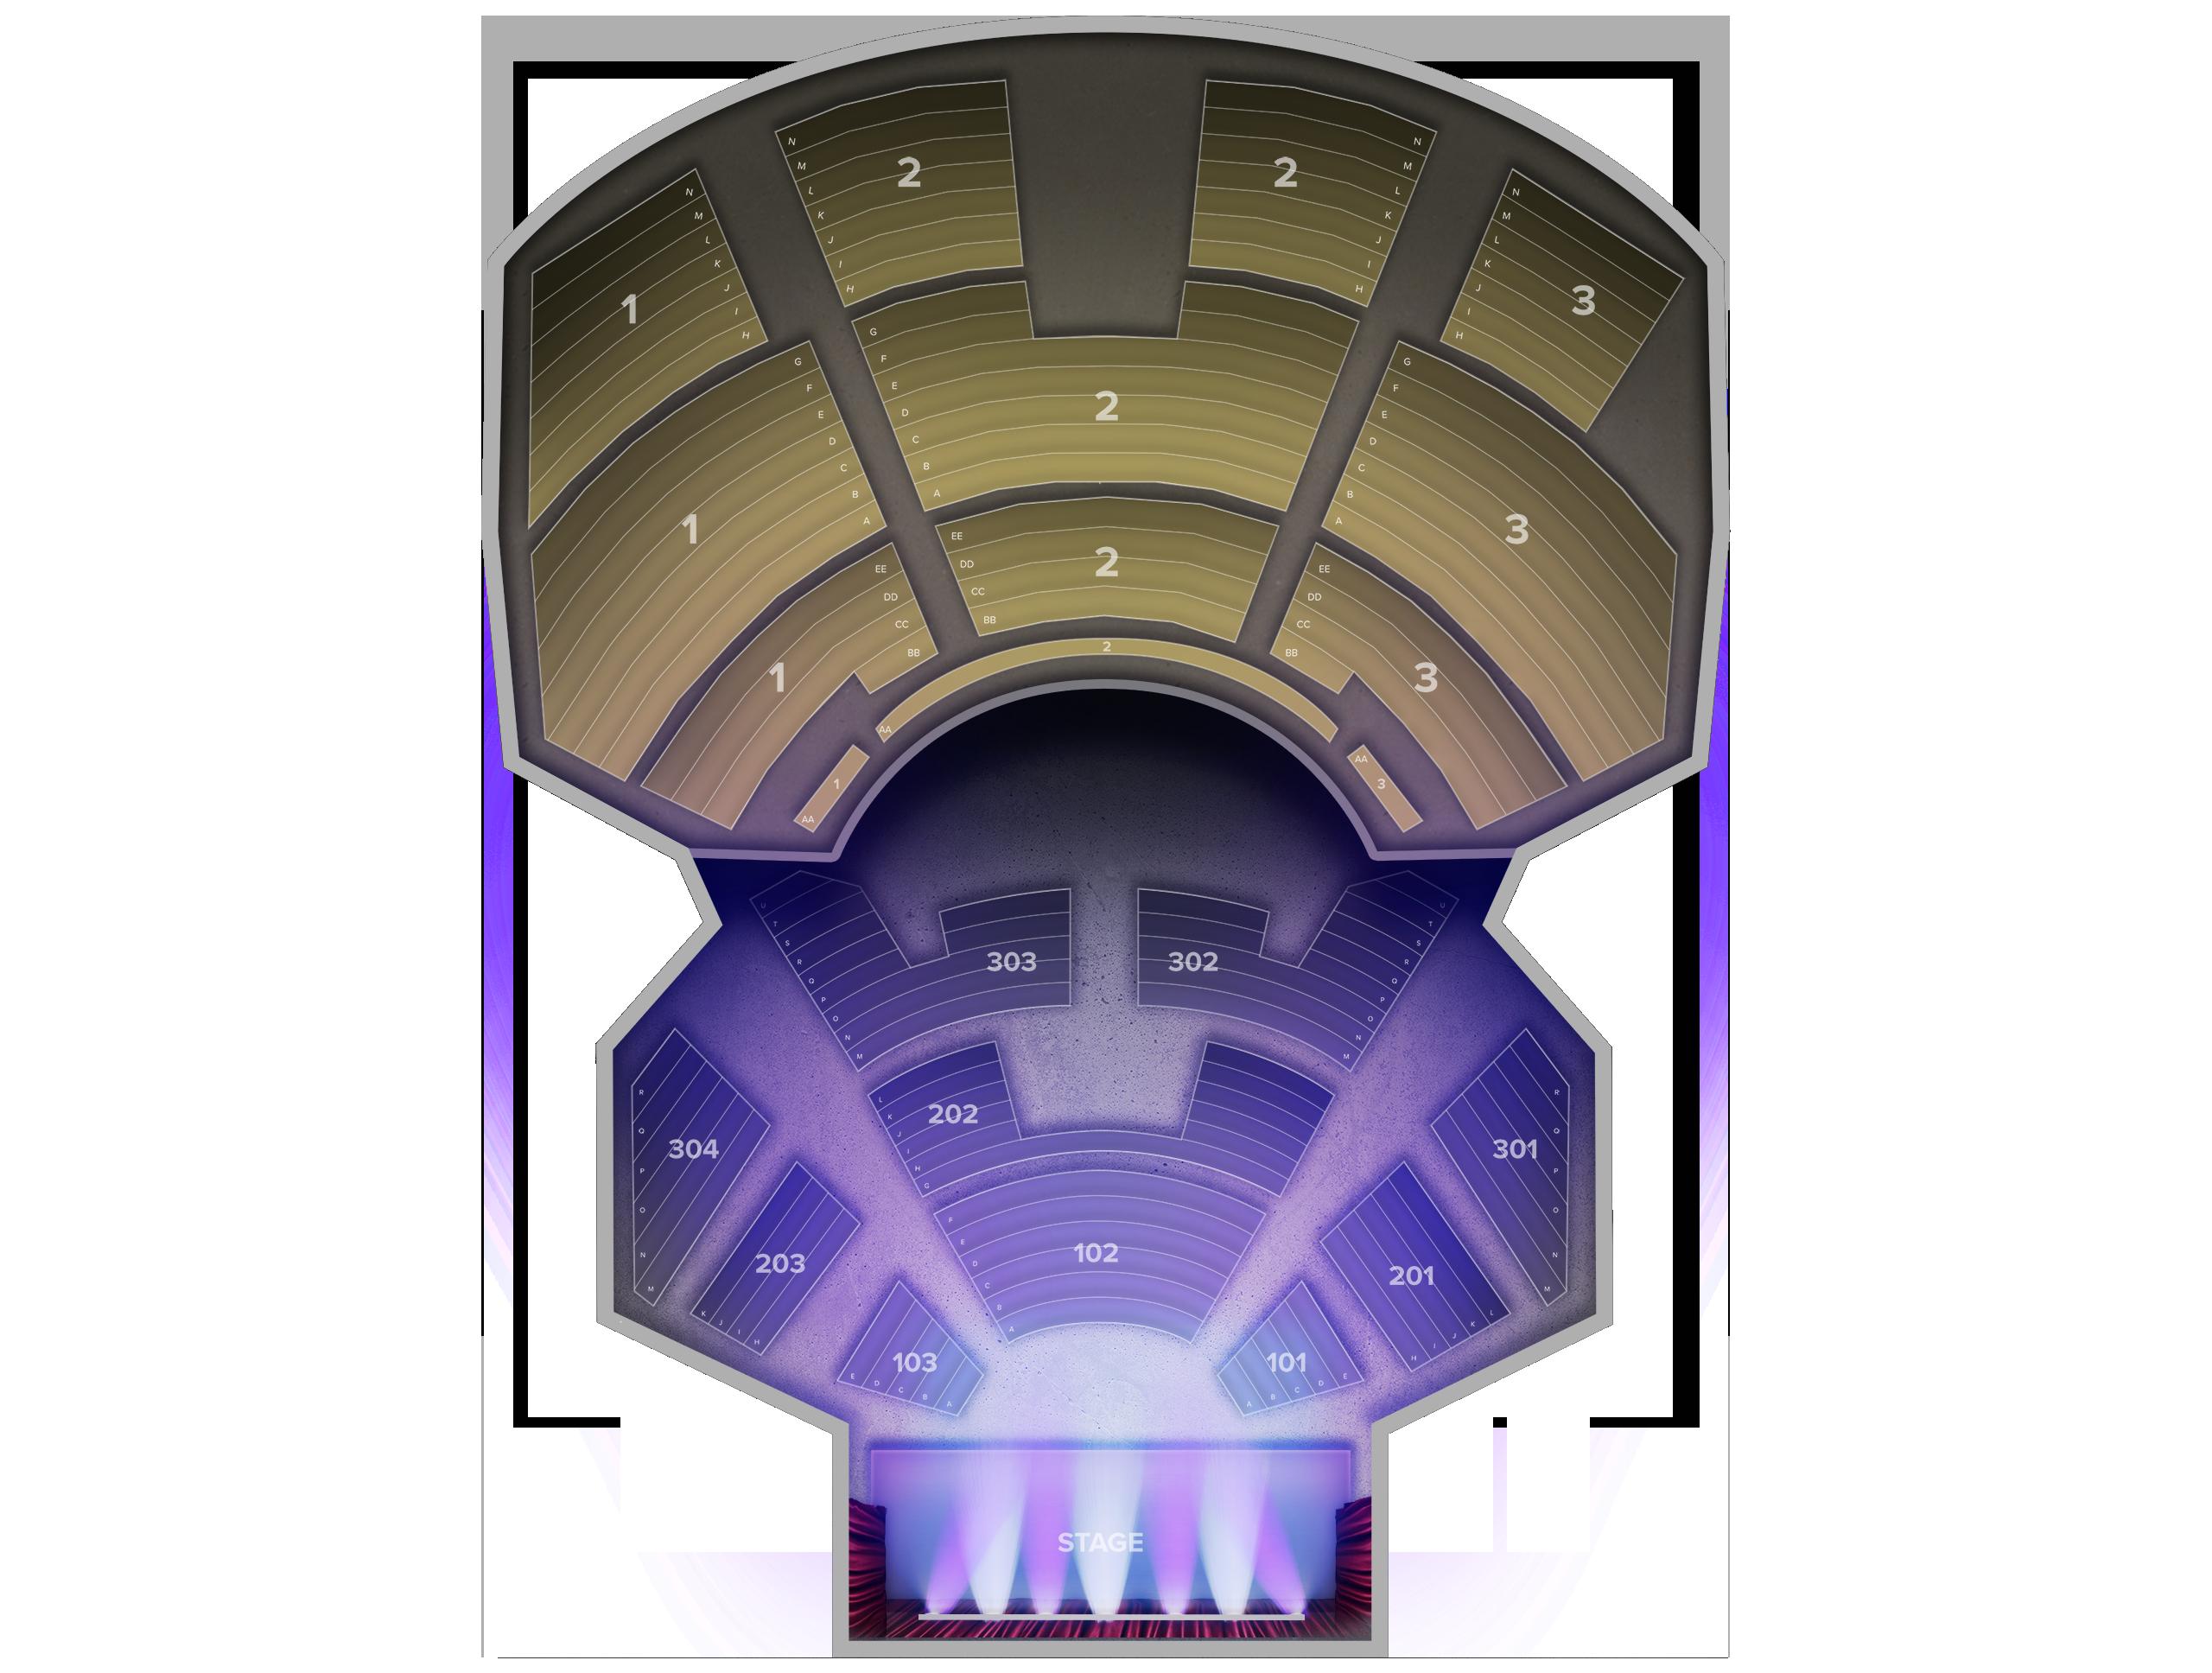 The Novo Tickets